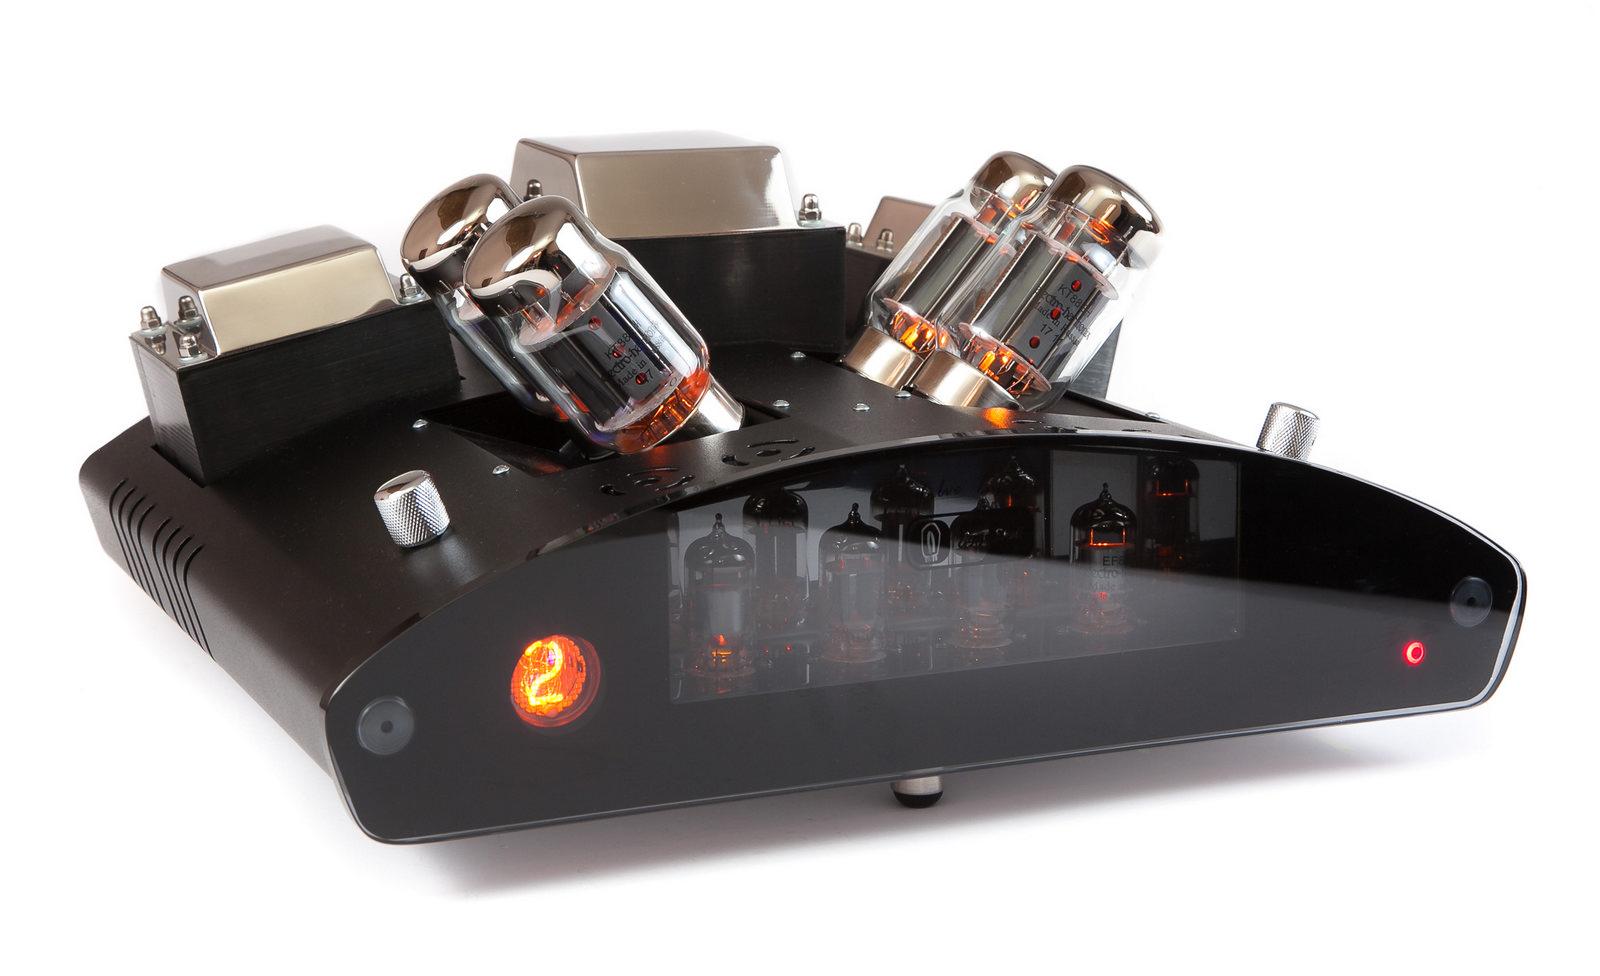 egg-shell_tanq_valve-audio-amplifier__24